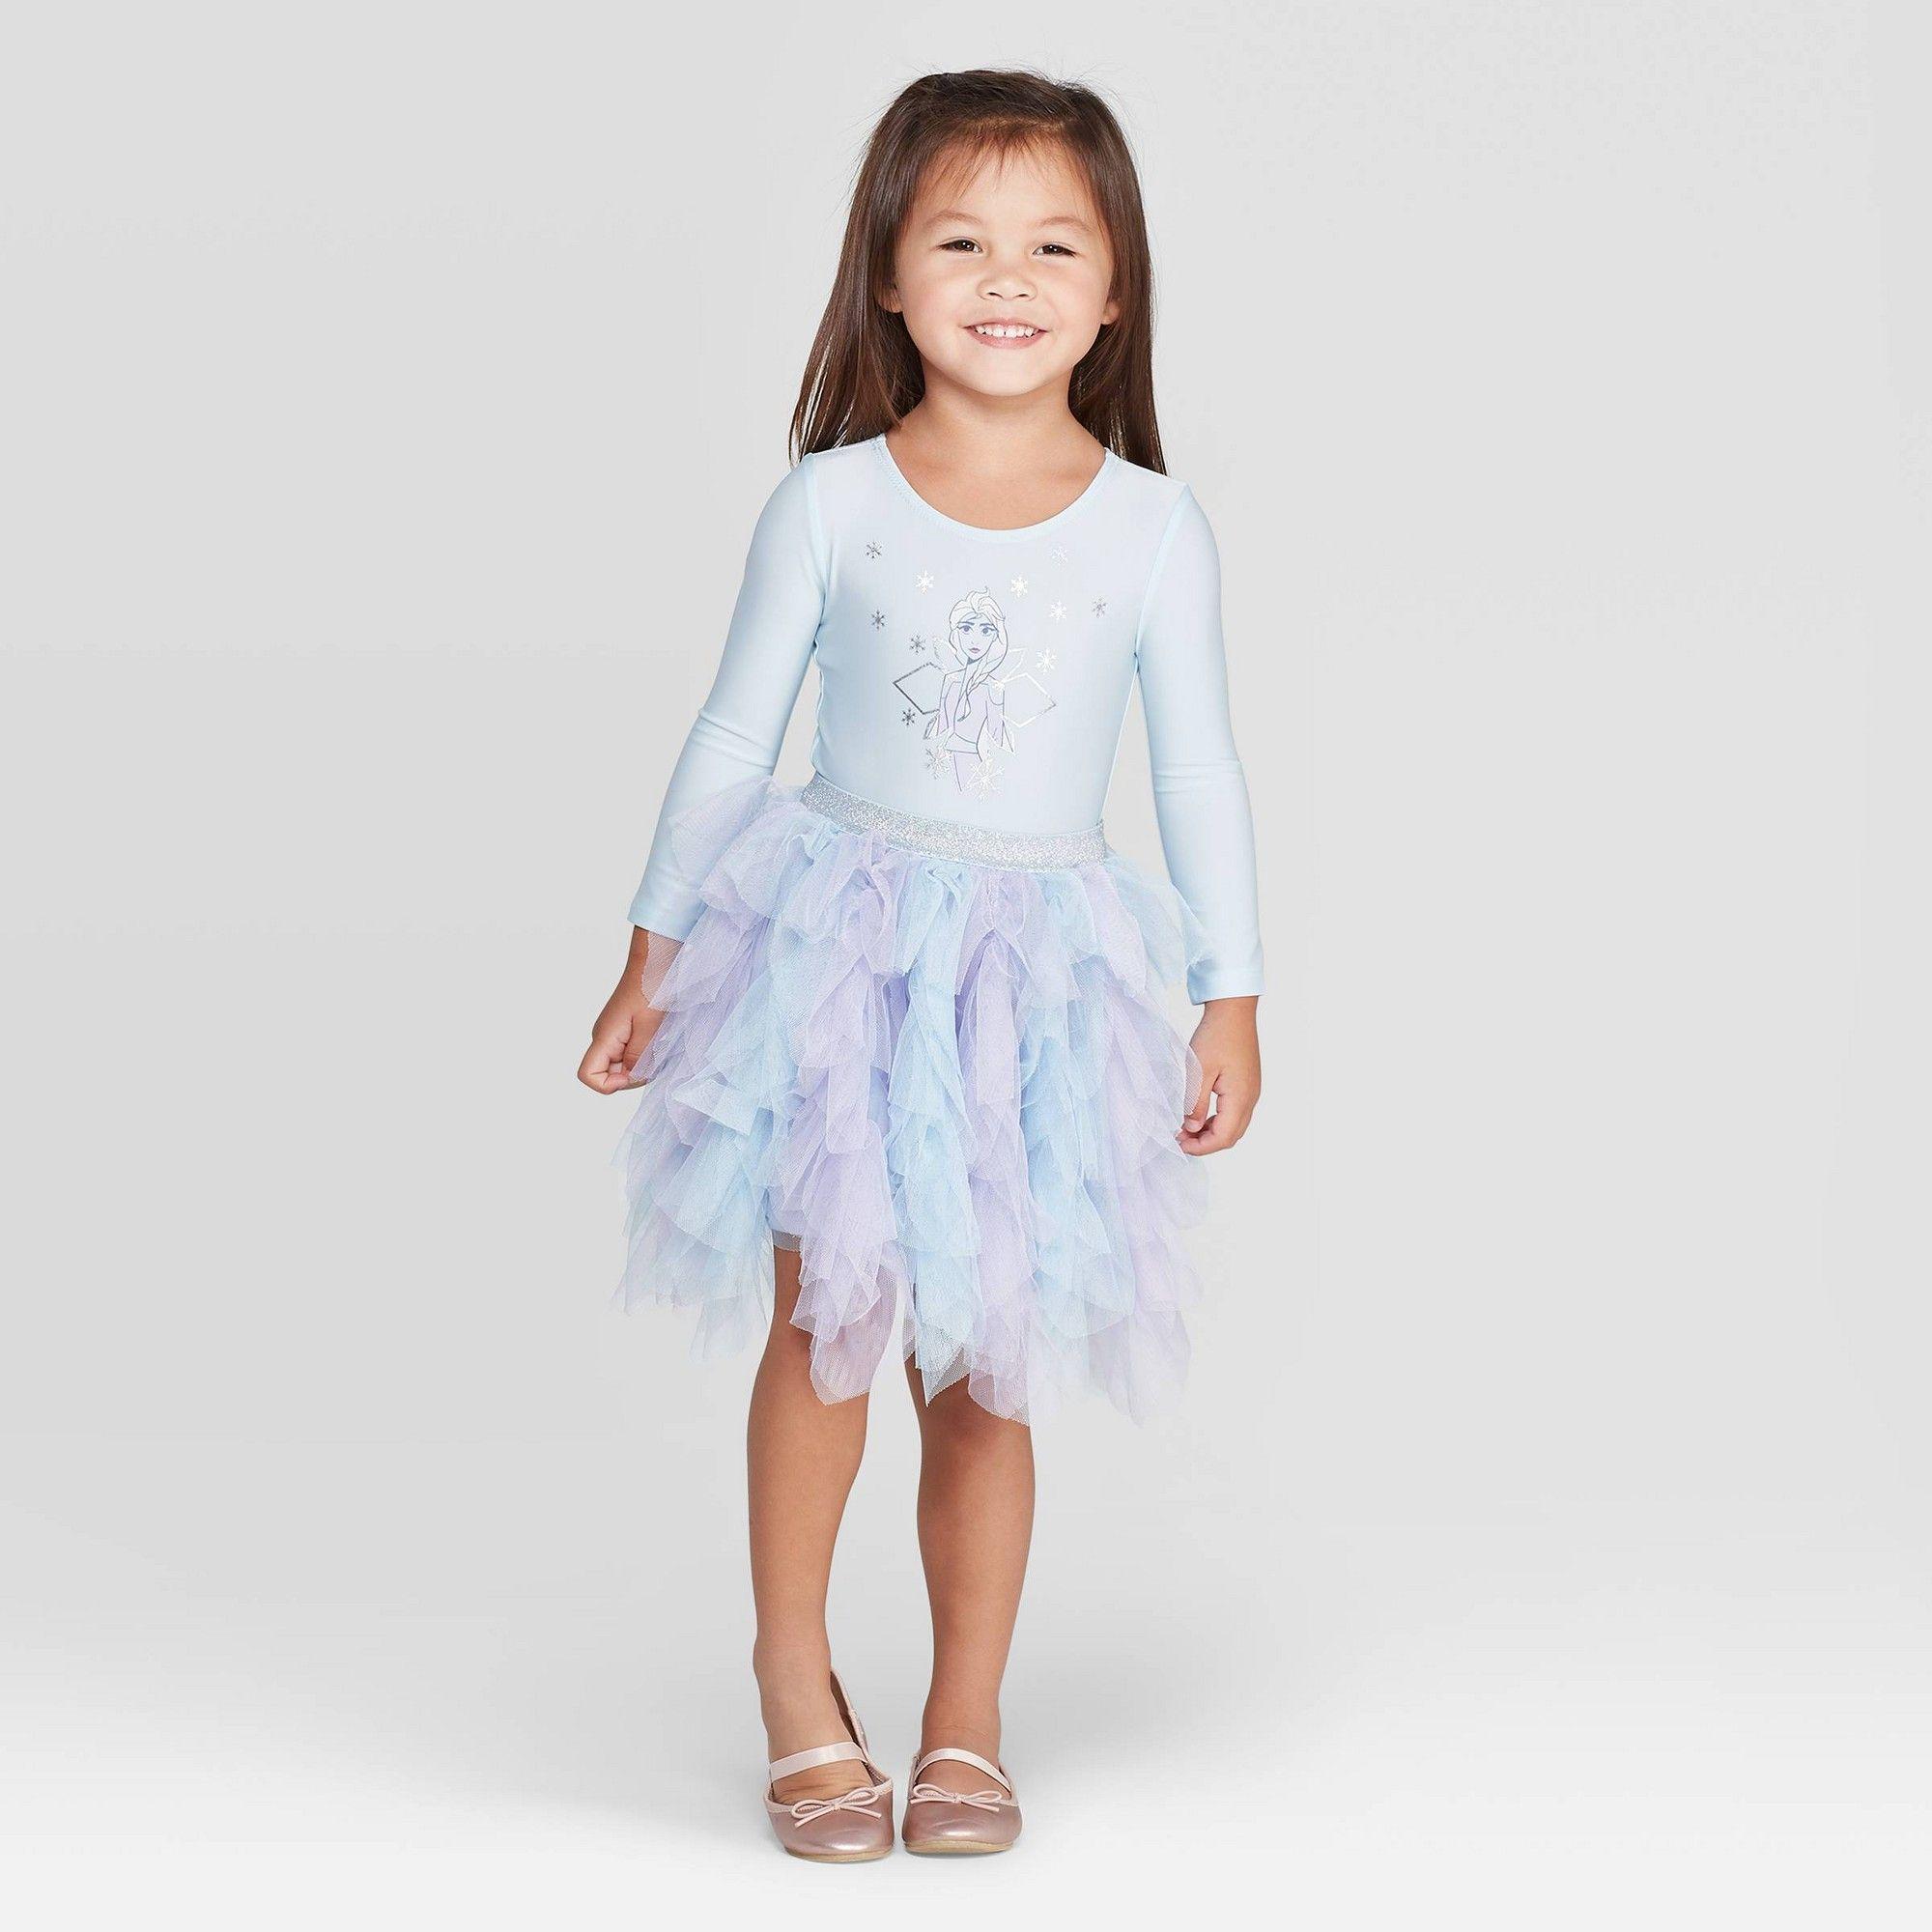 Toddler Girls Disney Elsa Long Sleeve Tutu Dress Light Blue 5t Girl S Disney Dresses Girls Lace Dress Crochet Dress Girl [ 2000 x 2000 Pixel ]